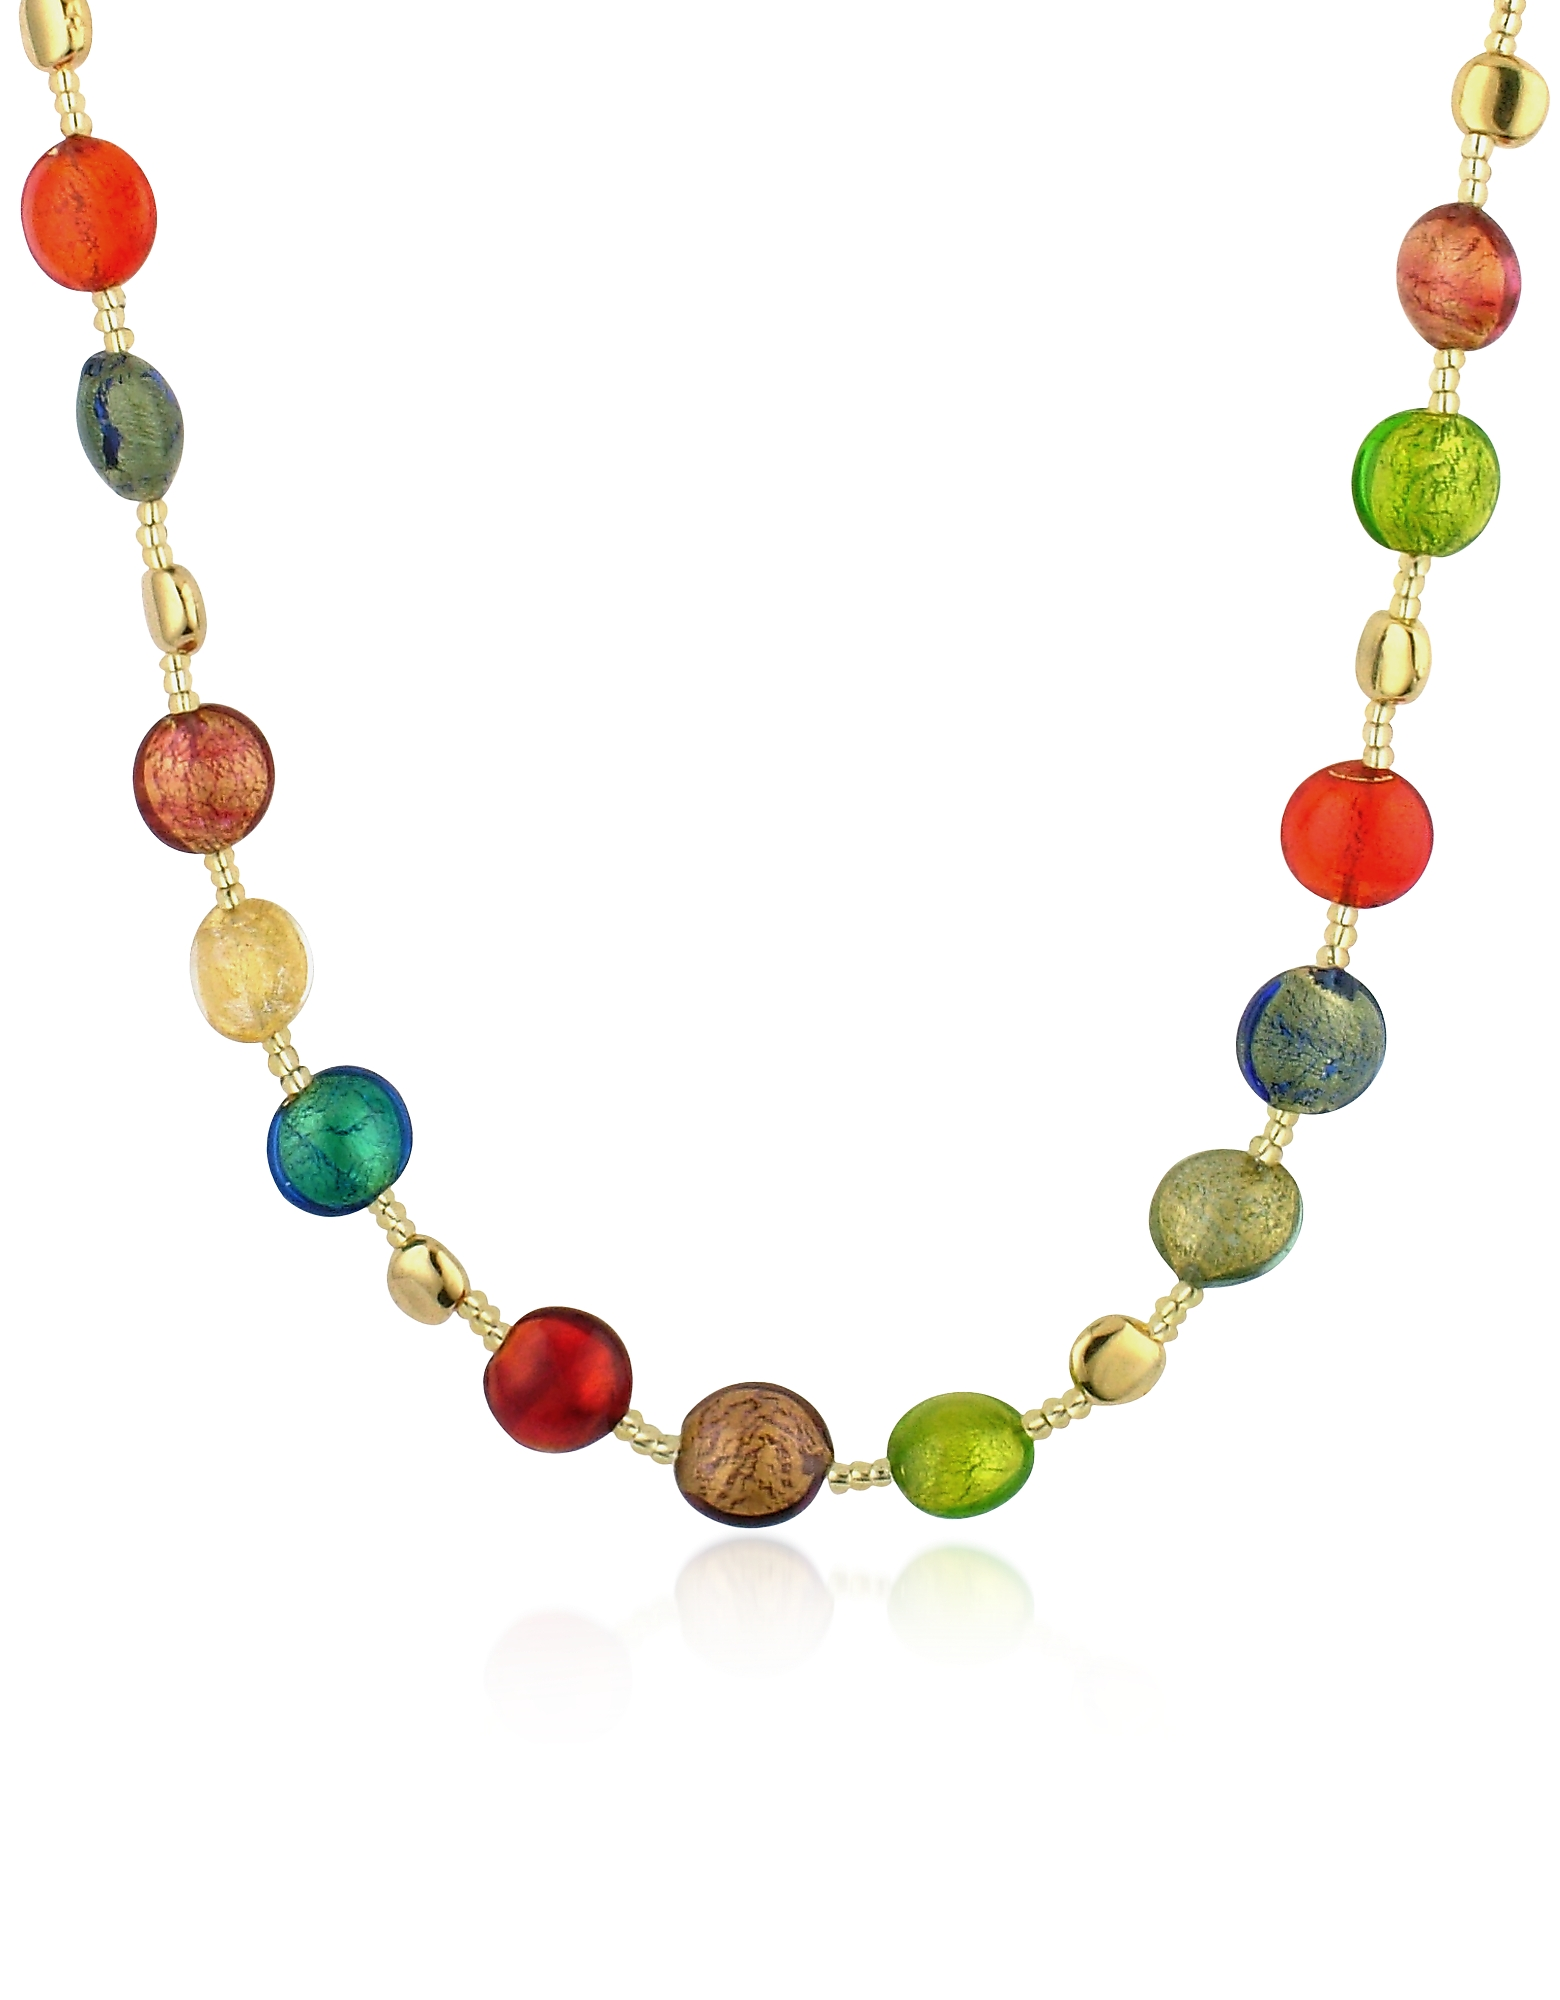 Antica Murrina Necklaces, Frida - Murano Glass Bead Necklace